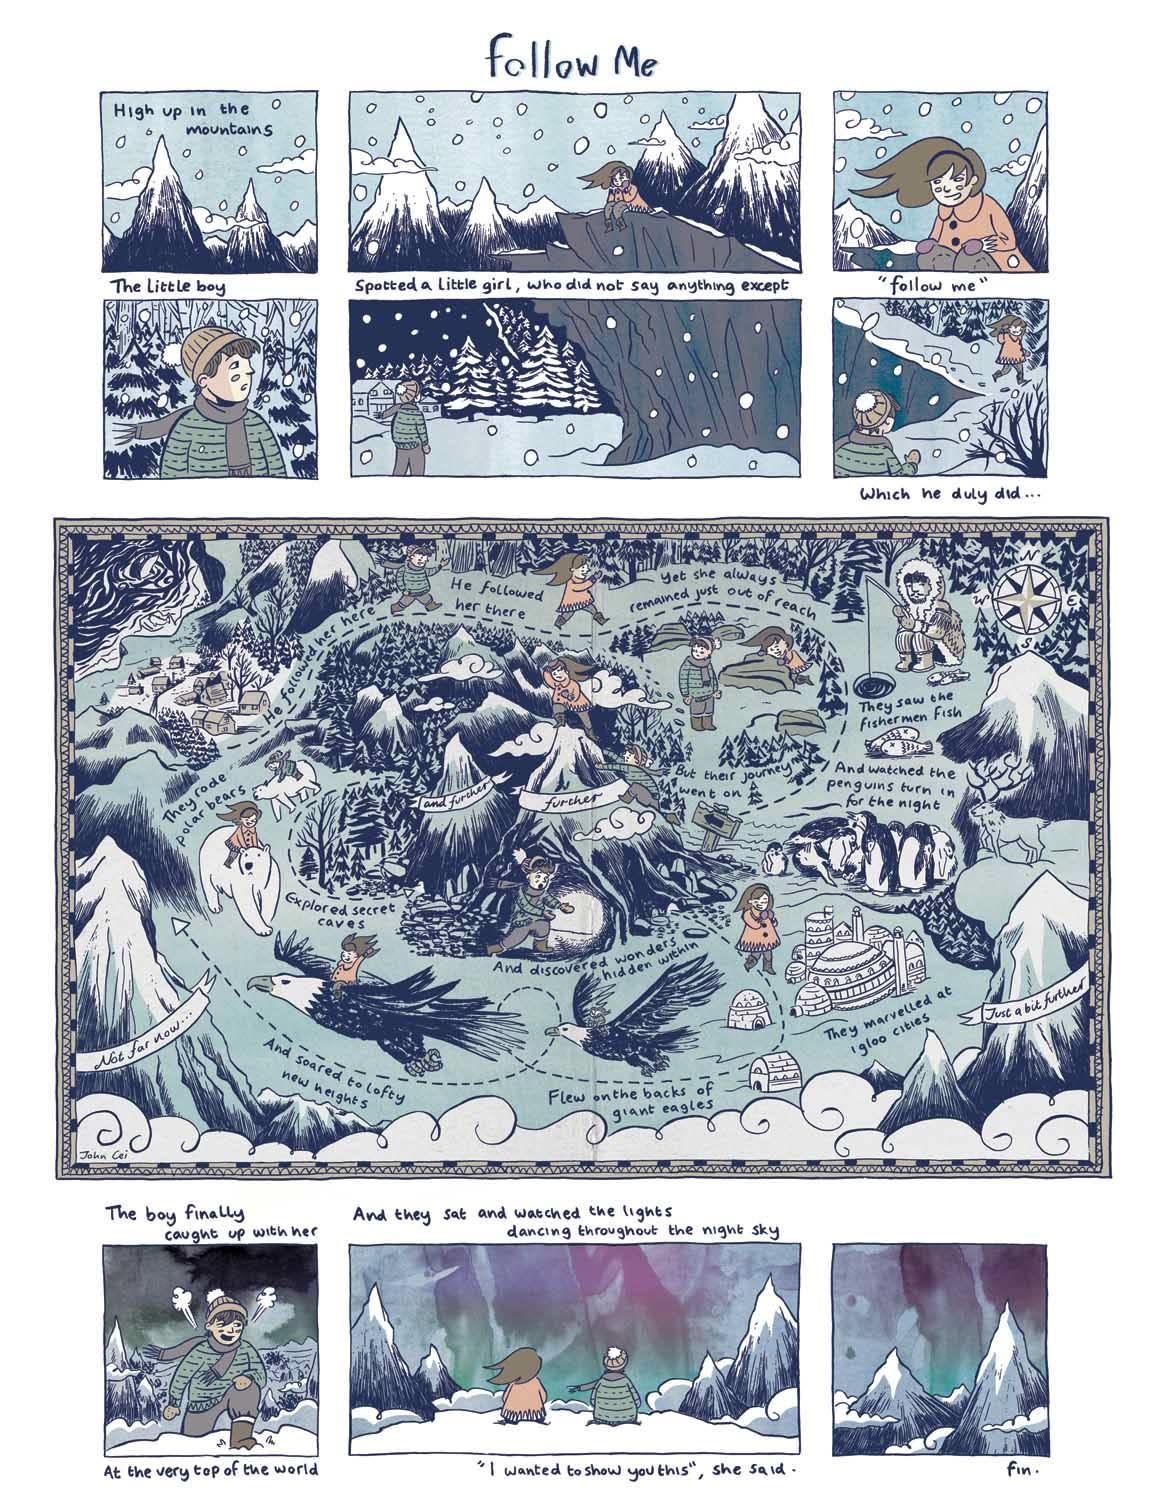 Camberwell-MA-Illustration-Follow-Me-comic-strip.jpeg